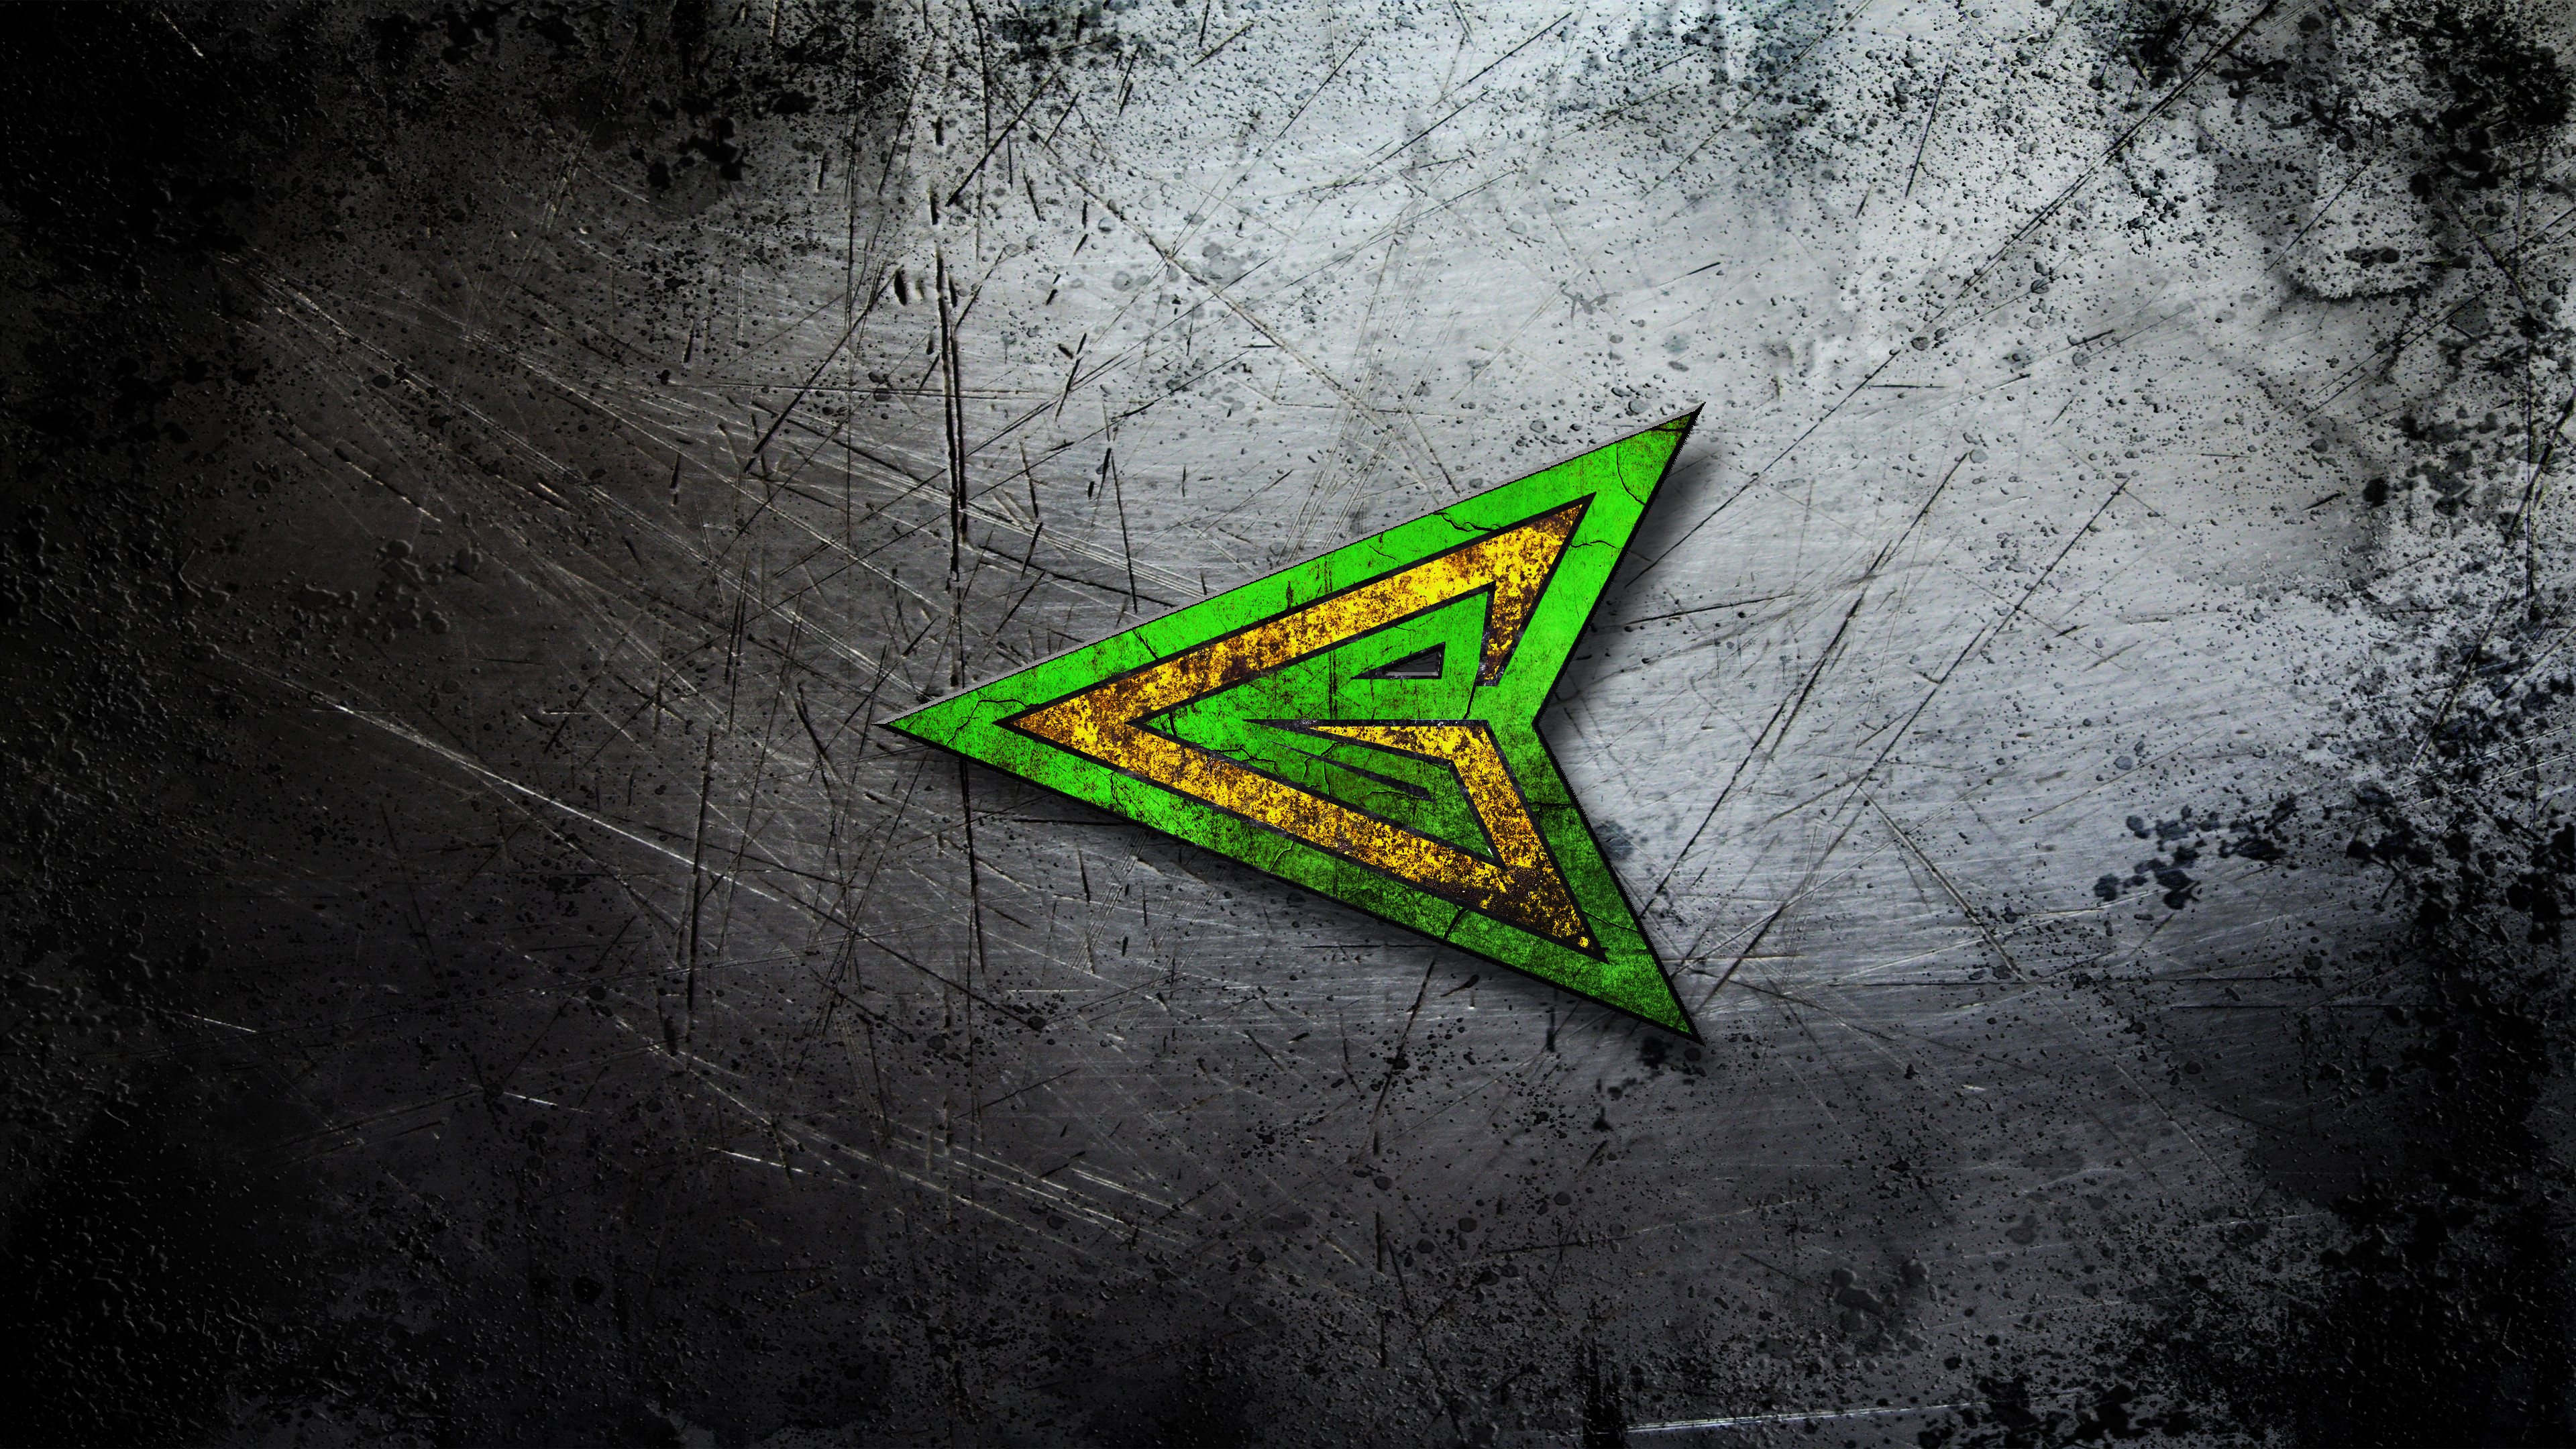 Green Arrow Computer Wallpapers Desktop Backgrounds 3840x2160 ID 3840x2160